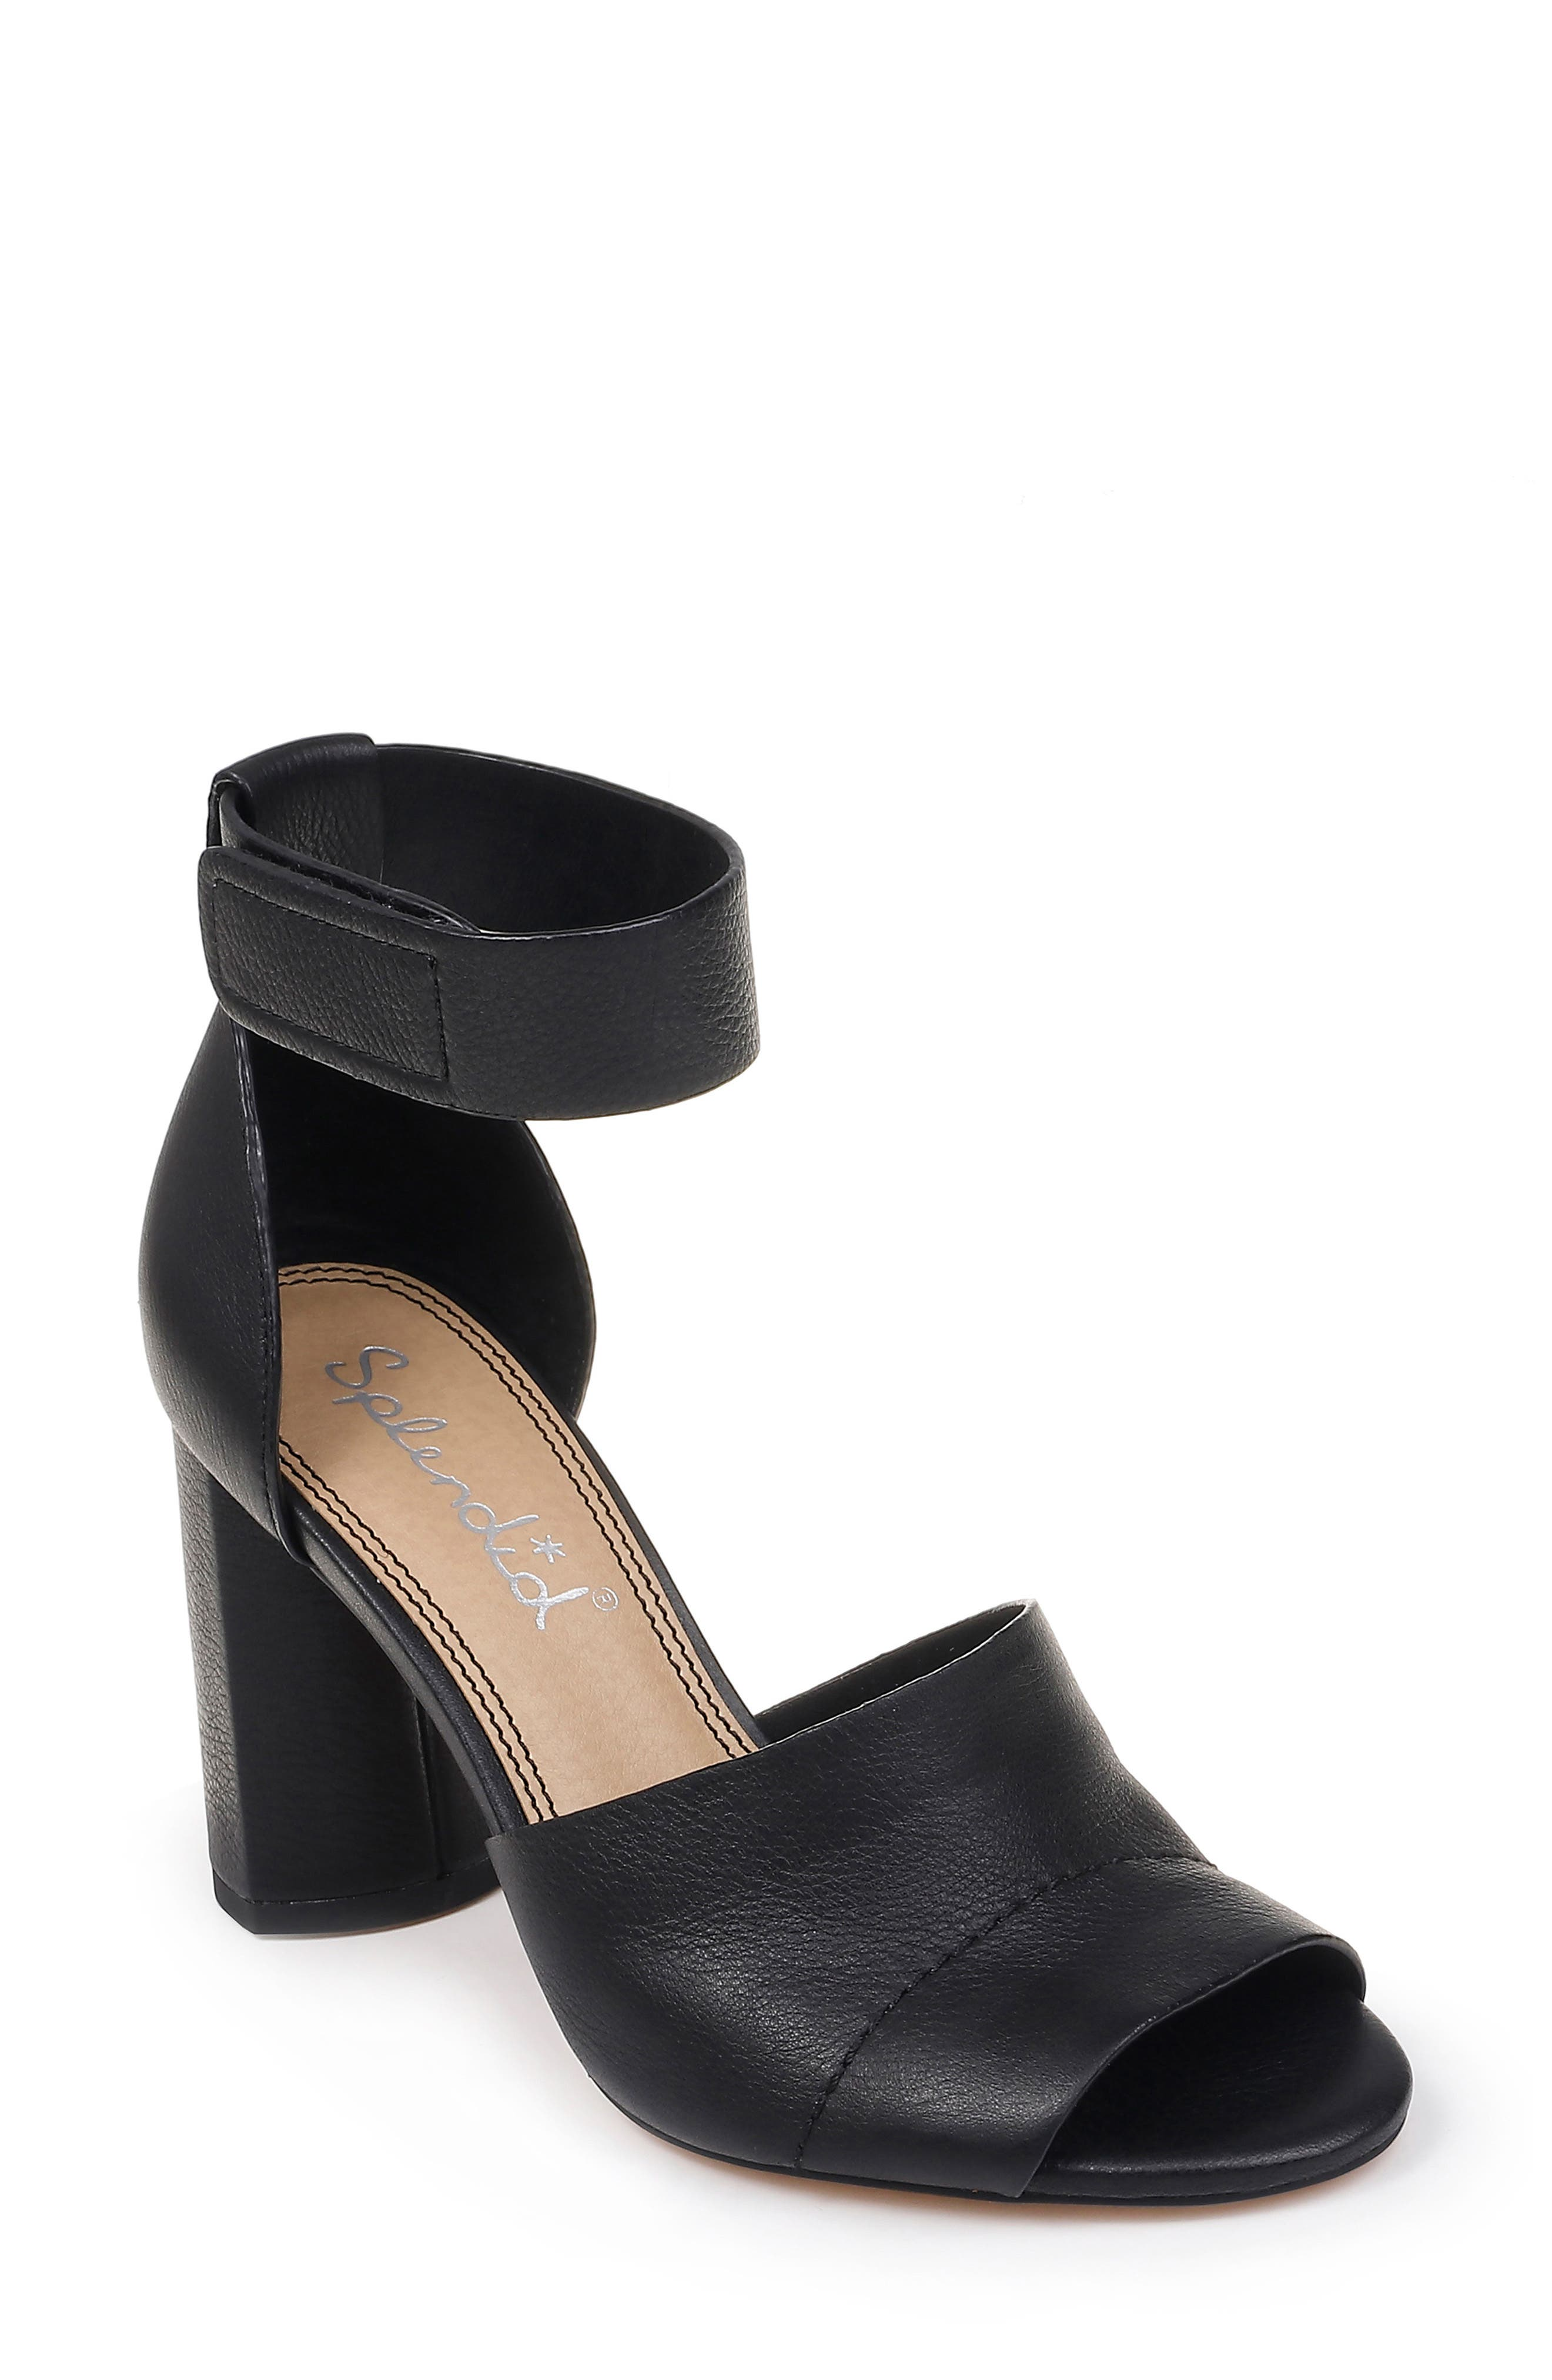 SPLENDID Thandie Ankle Strap Sandal, Main, color, BLACK NUBUCK LEATHER